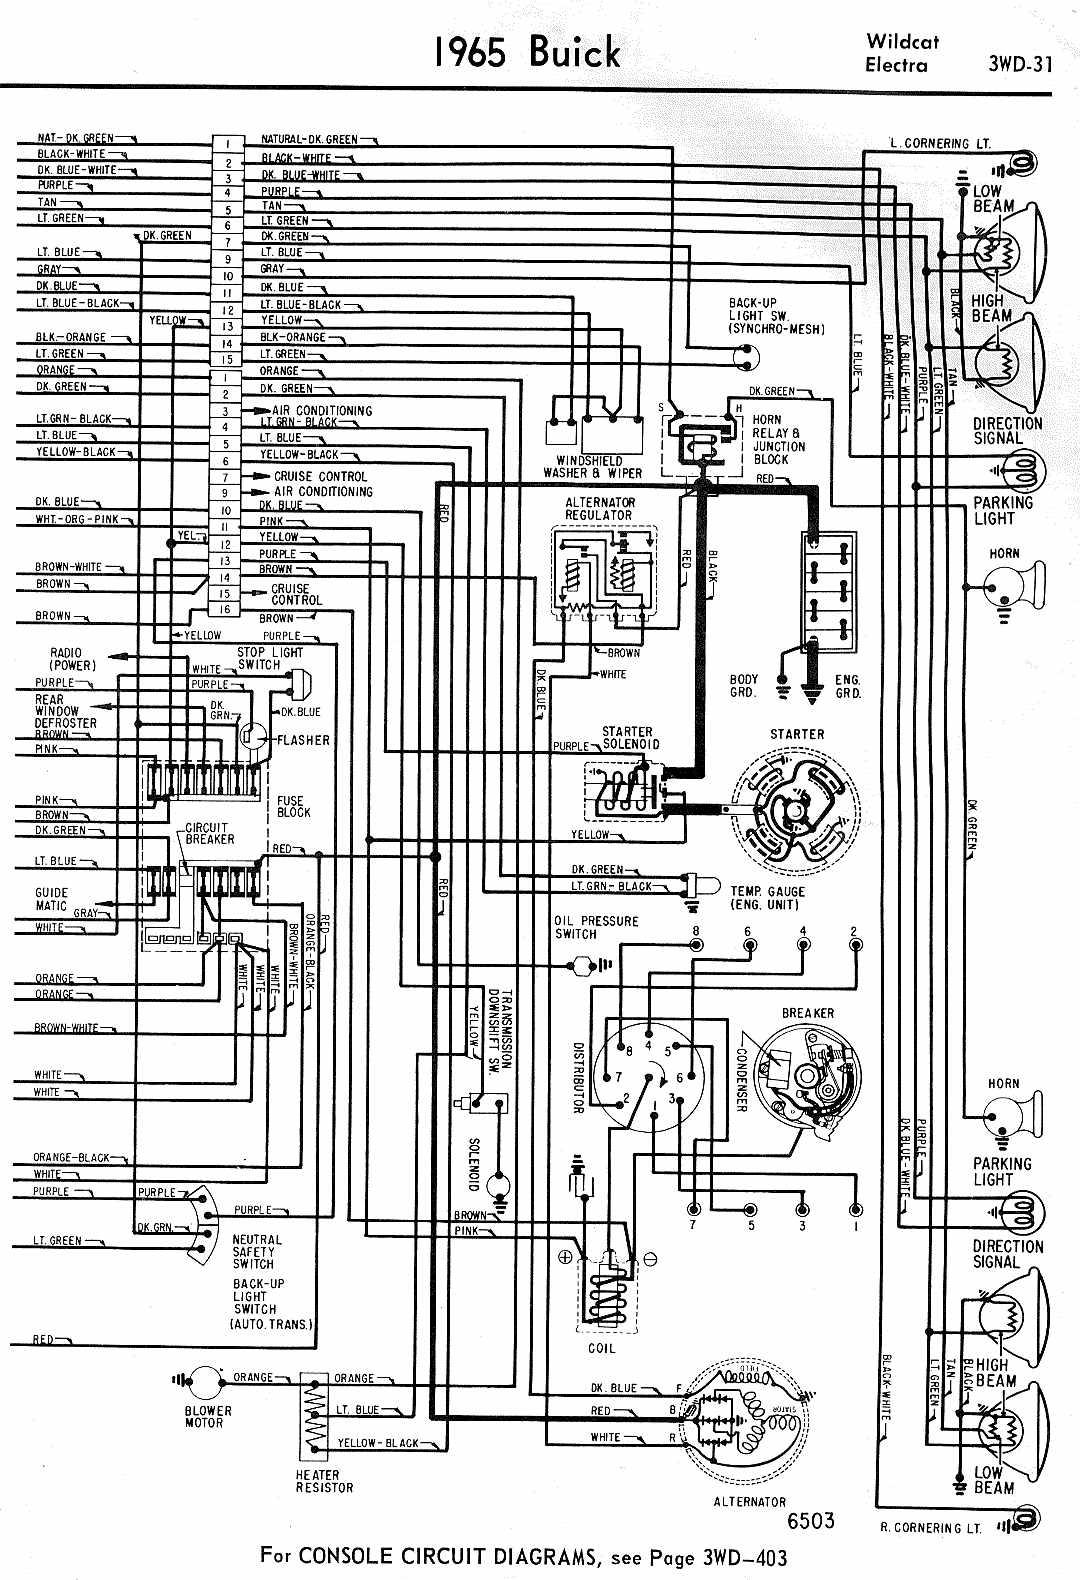 1967 1972 Chevy Truck On 1970 Chevy Nova Wiring Diagram Besides 1967